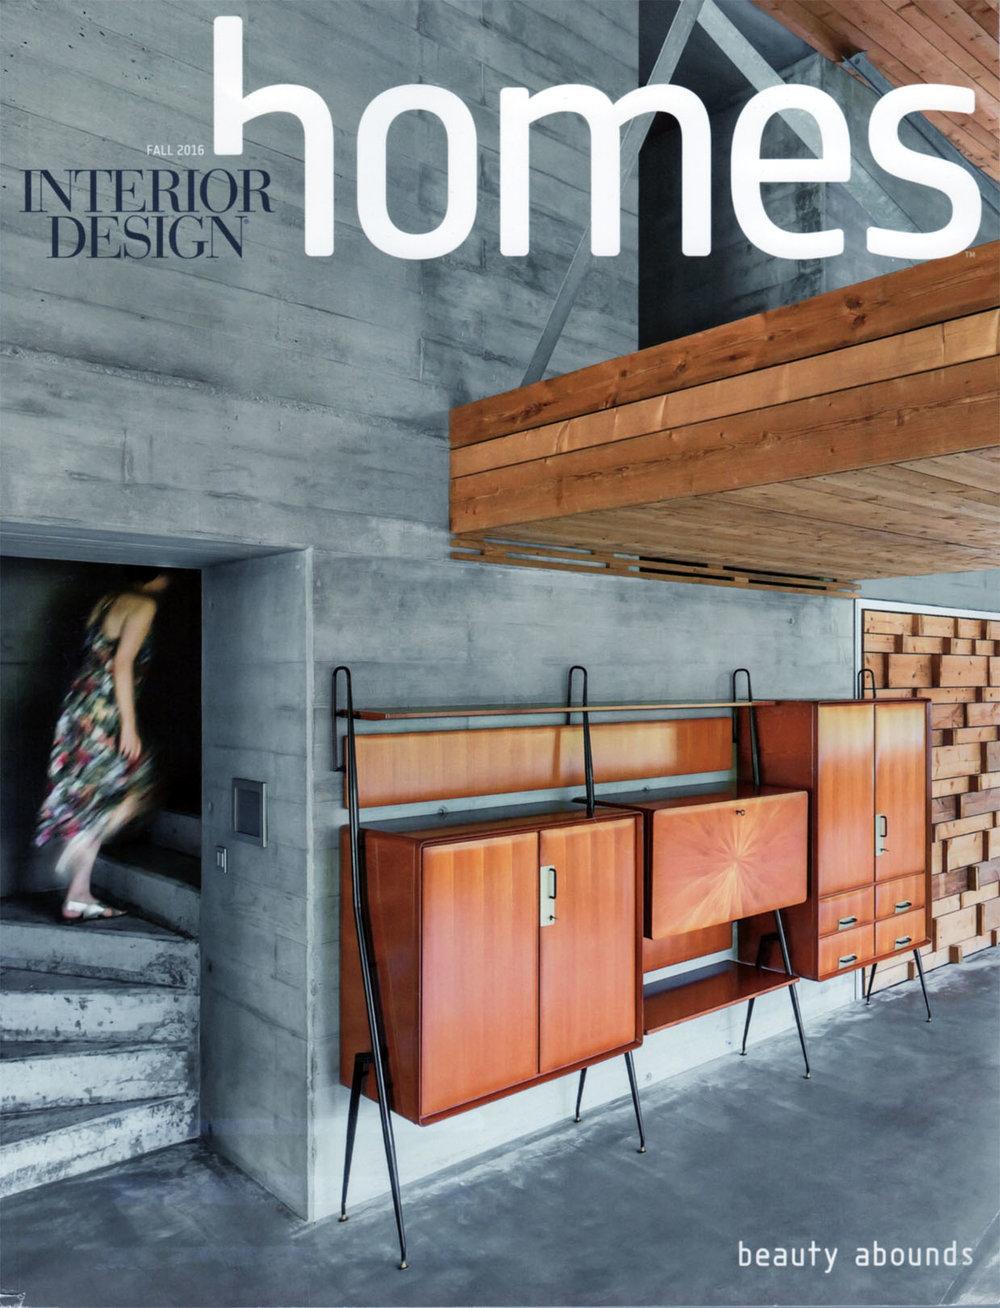 InteriorDesign_cover_Fall2016.jpg